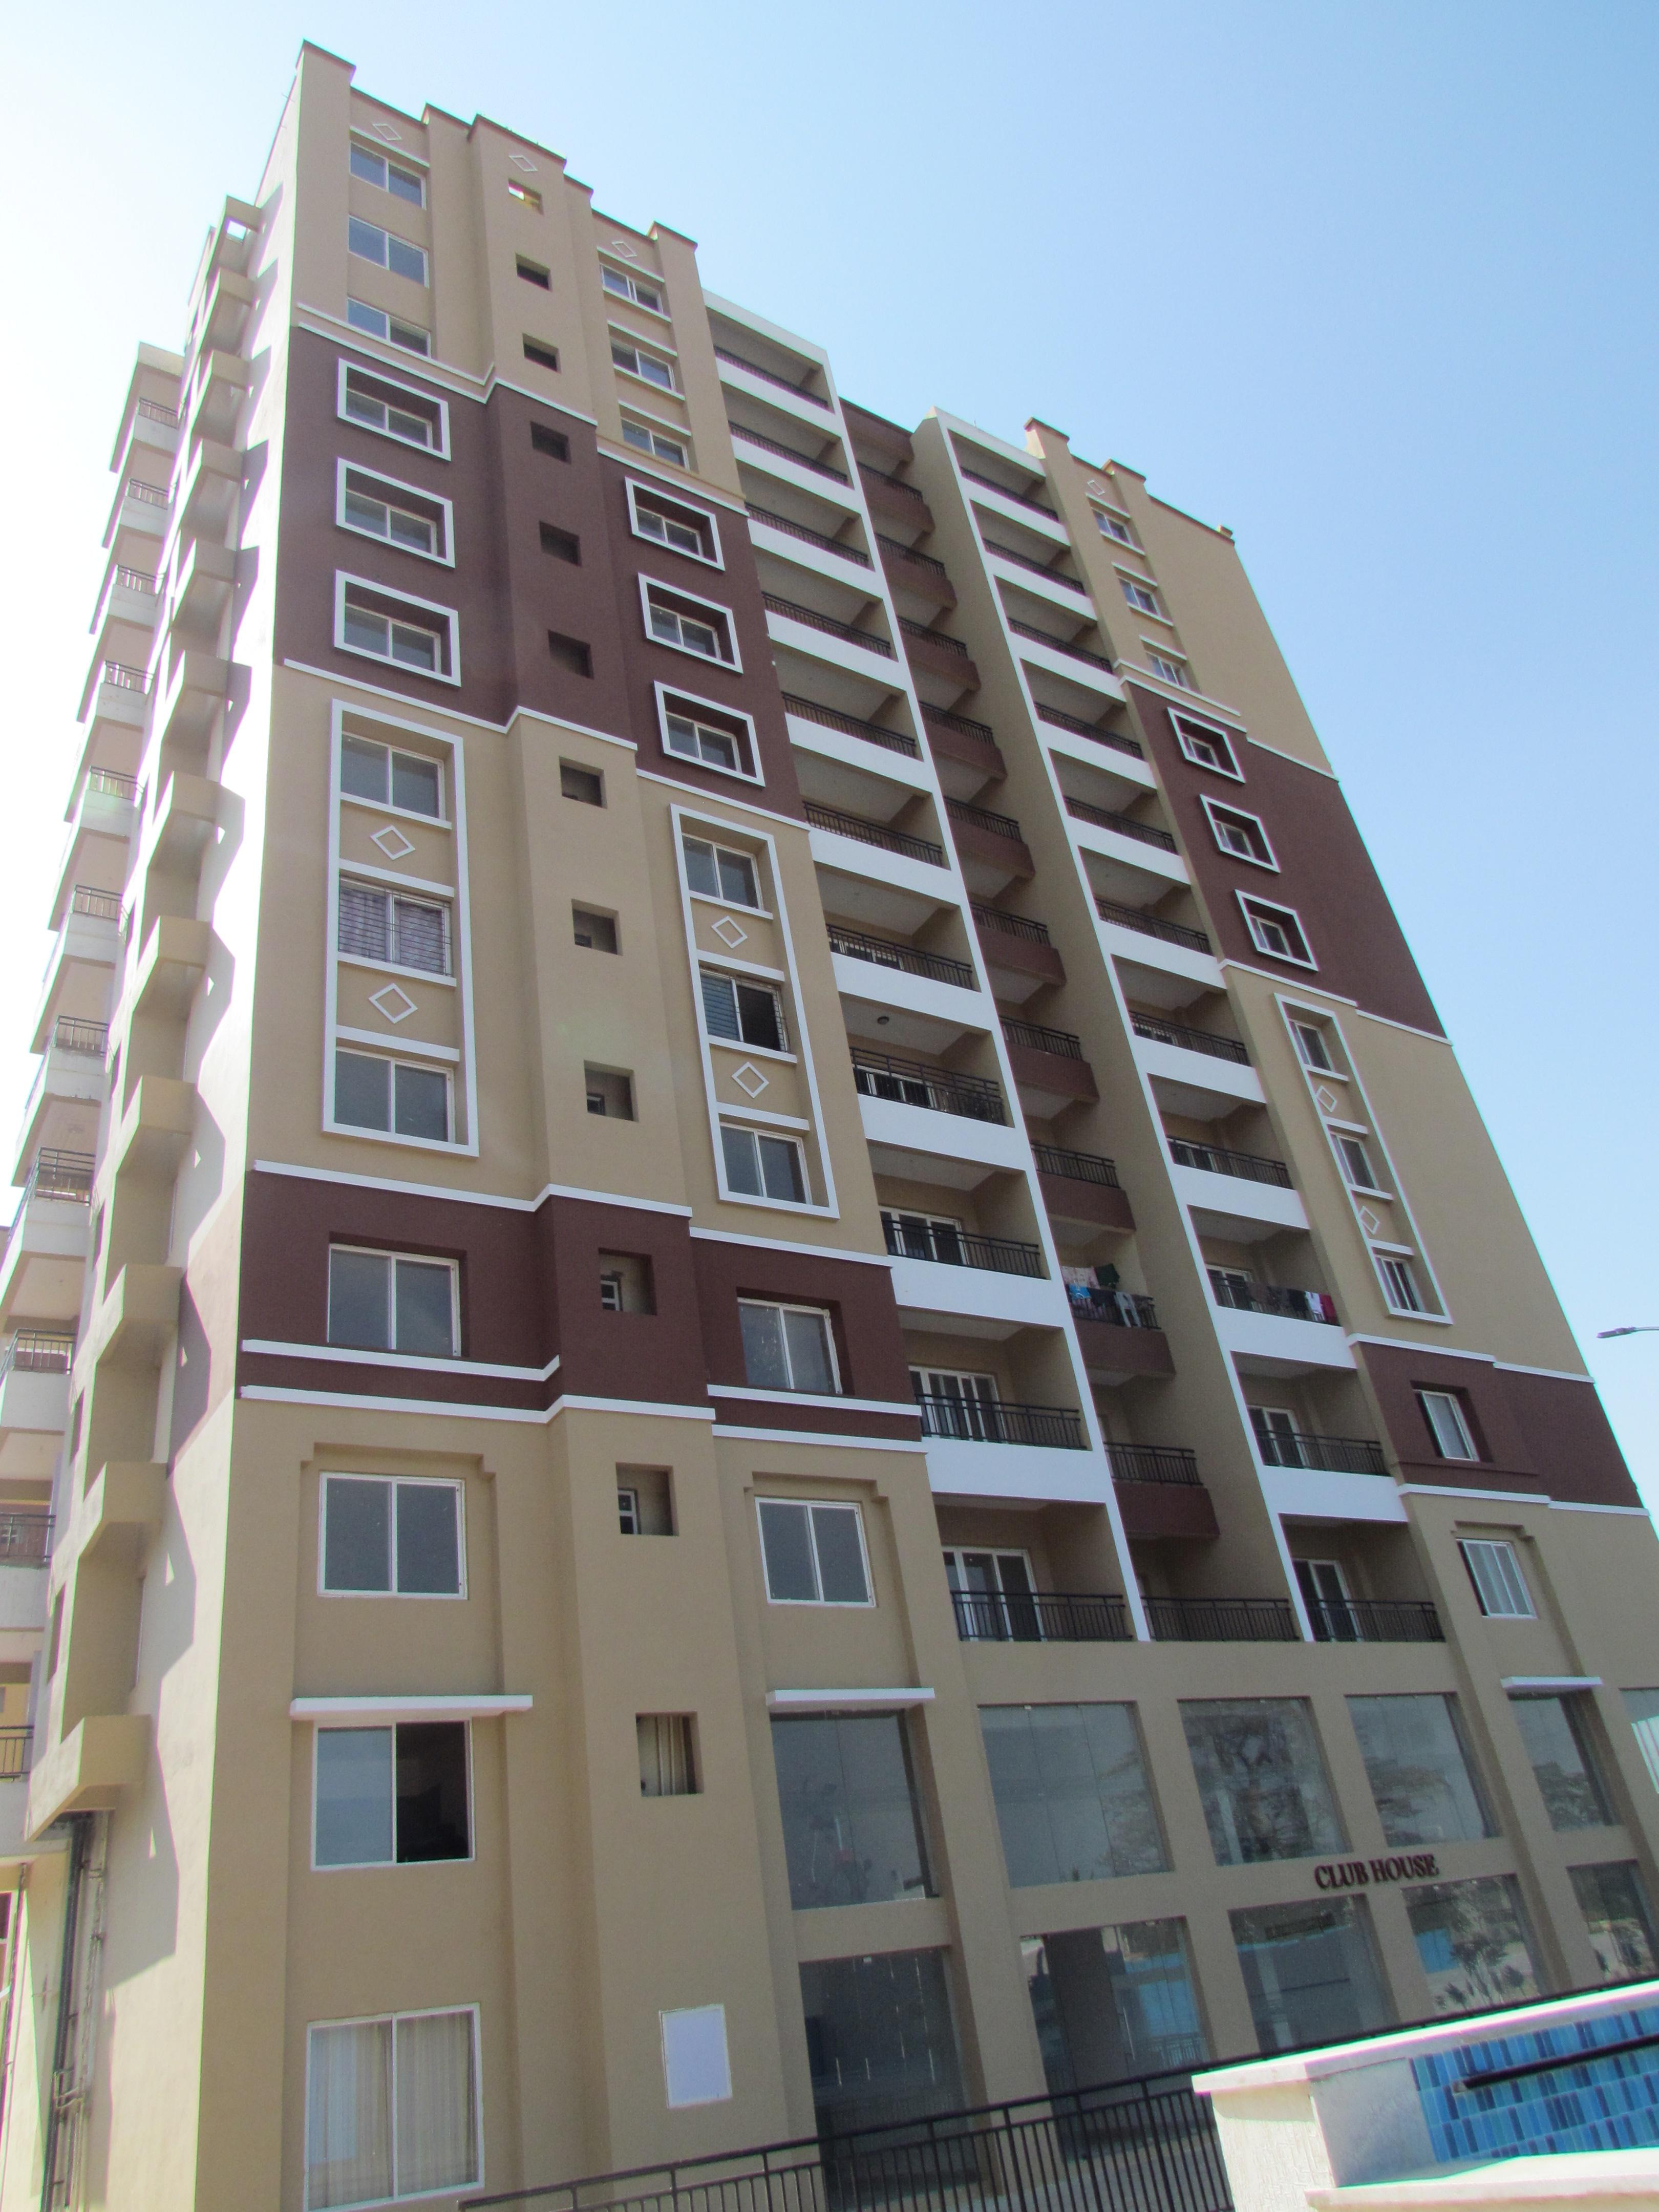 3bhk Luxury apartments in Jp nagar Bangalore http://www.maangalyadevelopers.com/prosper_layout_plans.html